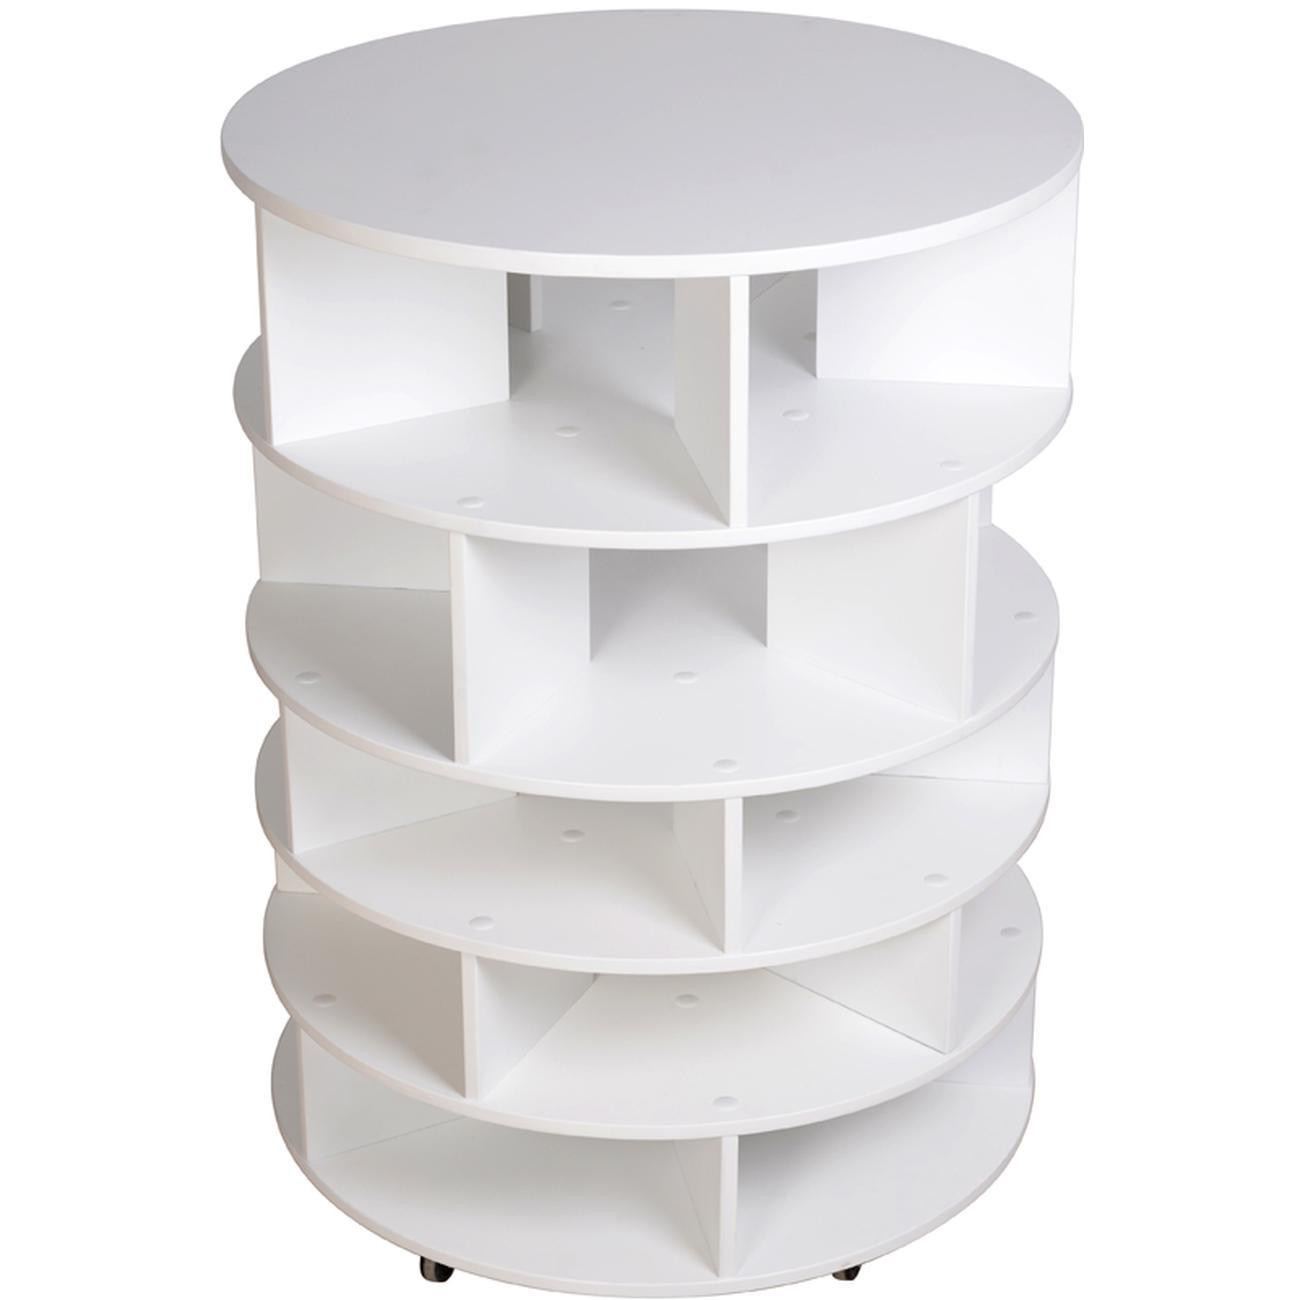 meuble a chaussure rotatif en bois may blanc bobochic